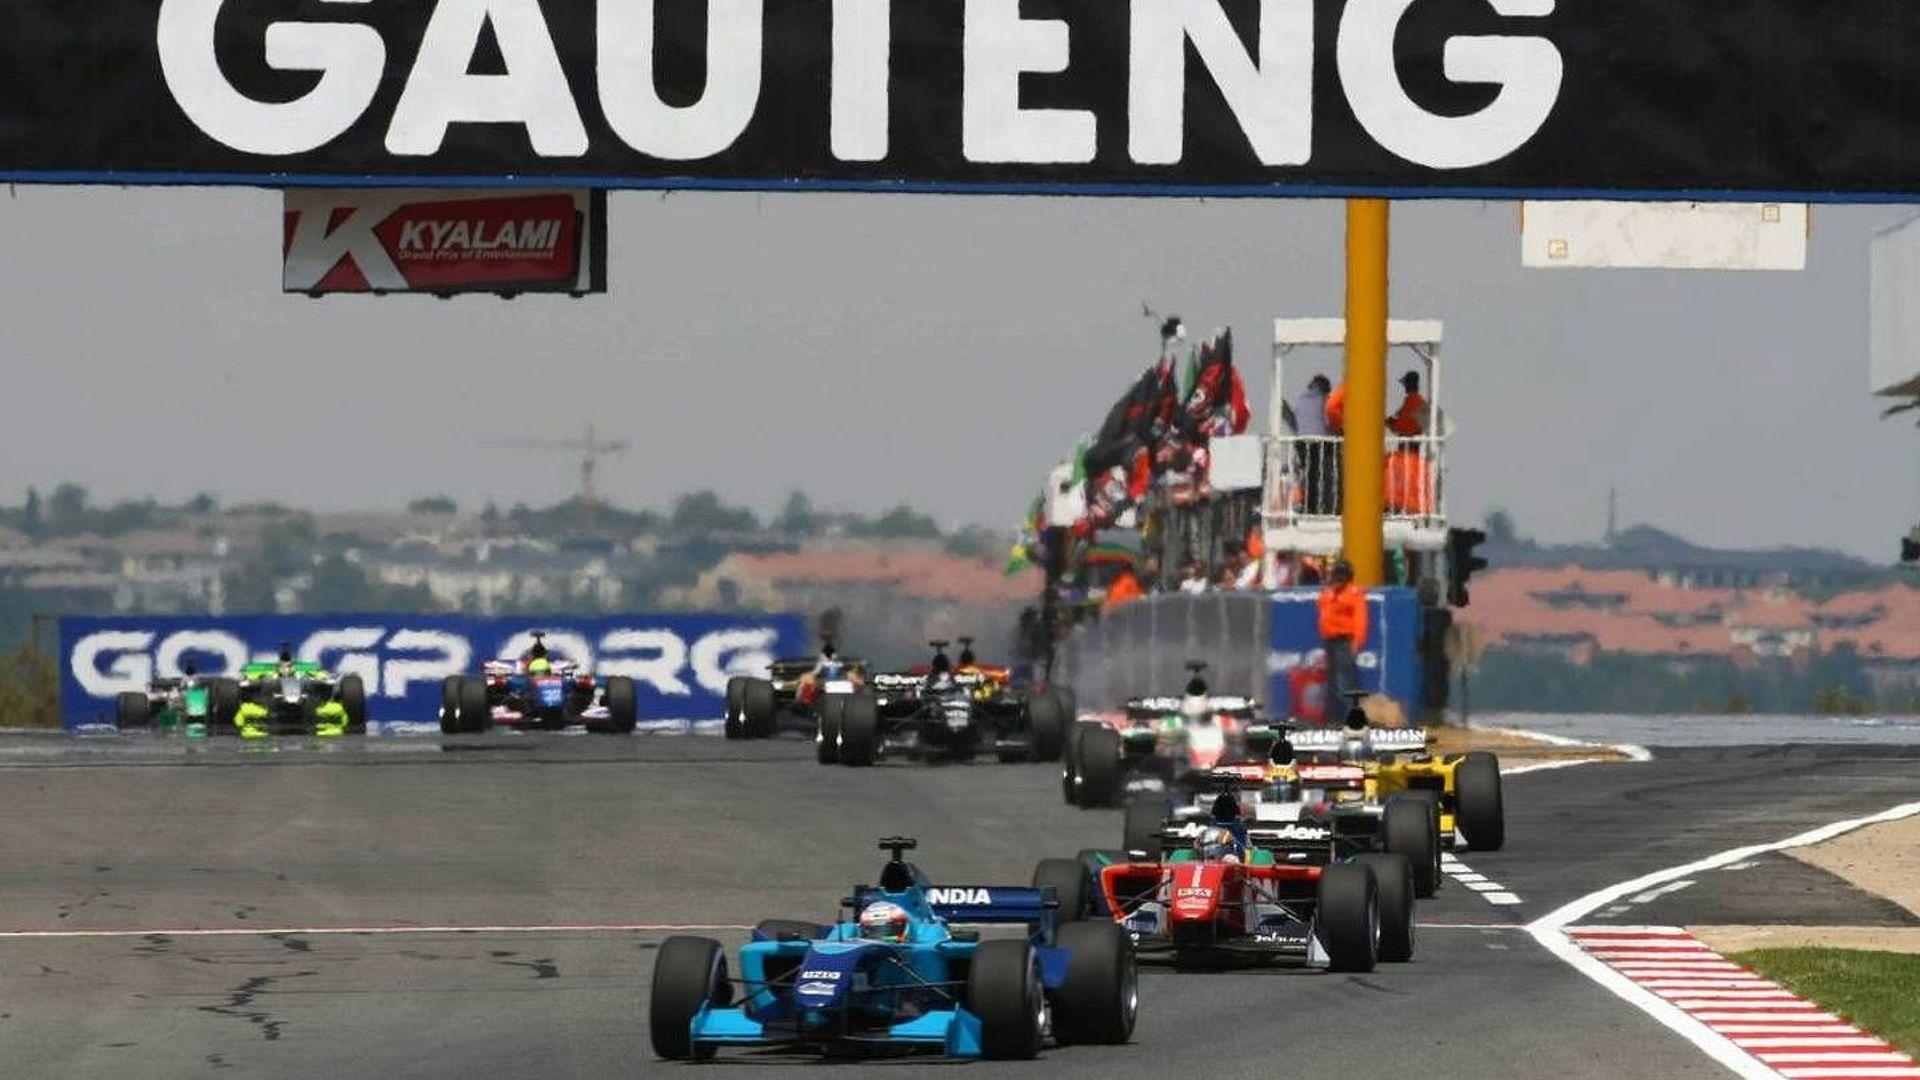 Cape Town GP plans still alive - report